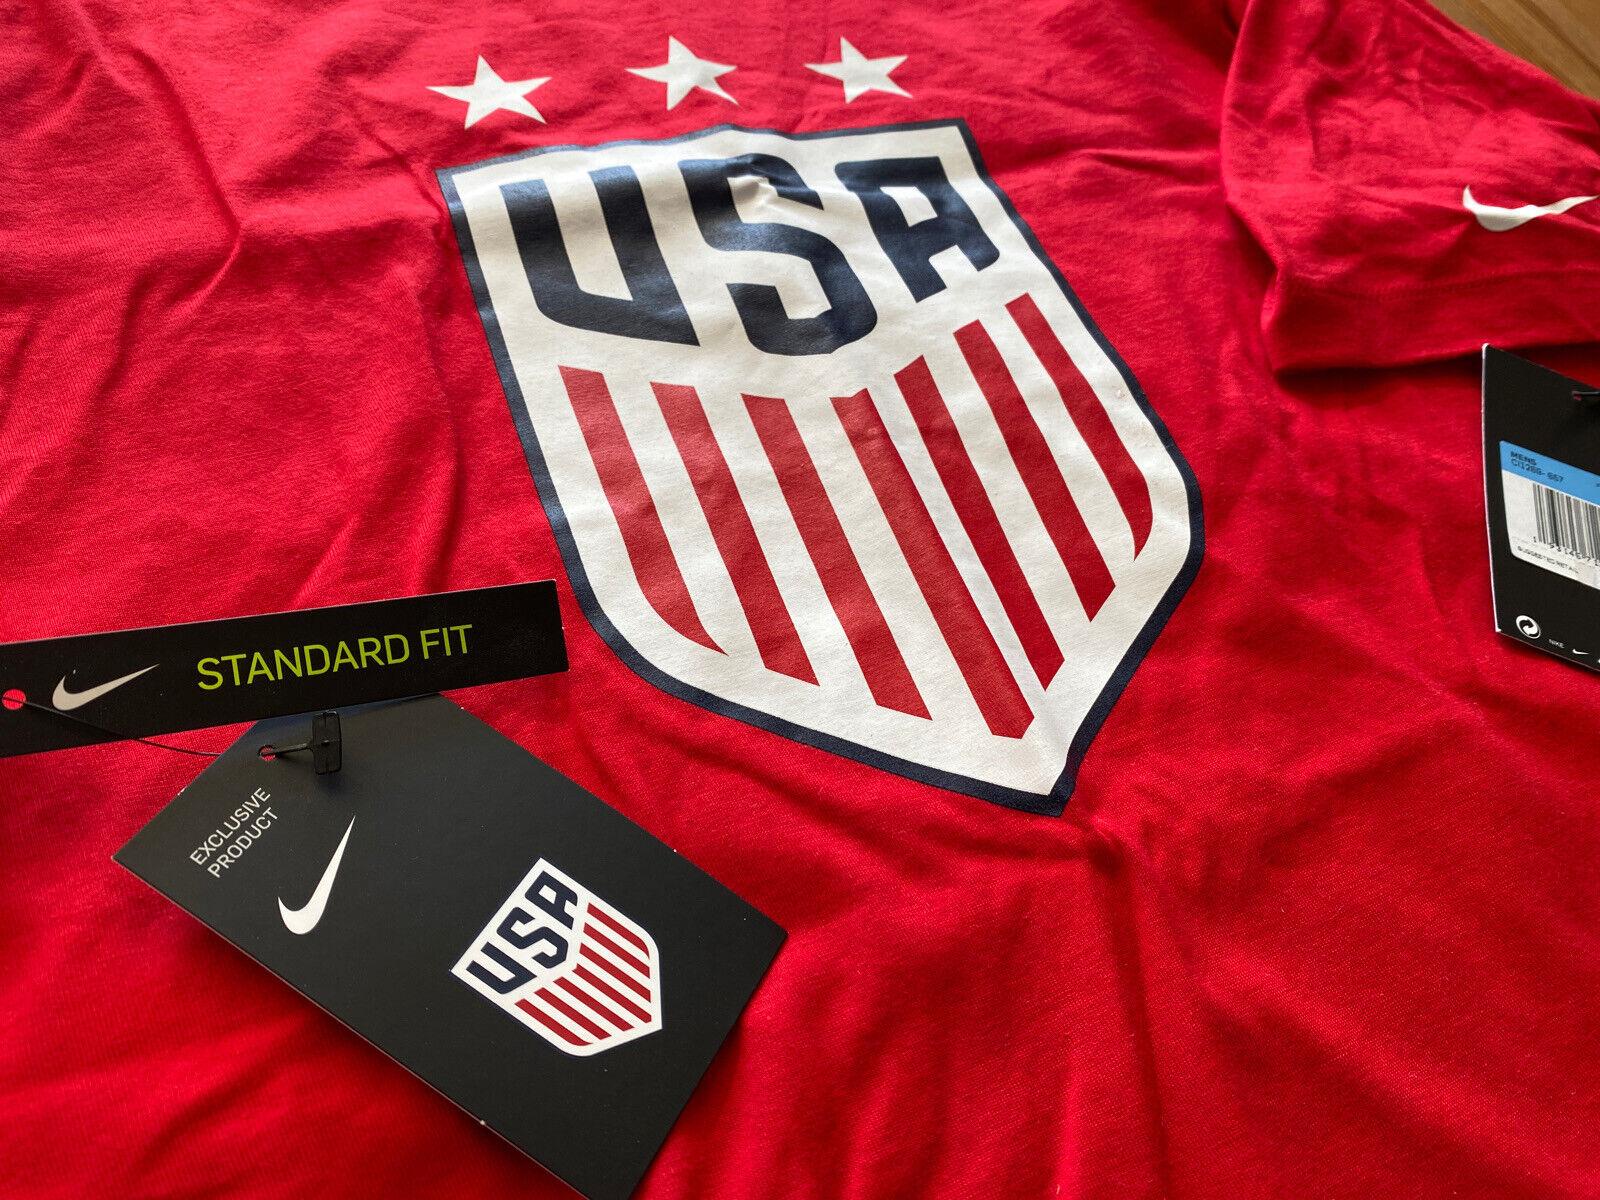 Faial Universal presión  Nike Men's USA National Soccer Team Shorts 729680-480 Size M 28 Blue for  sale online | eBay